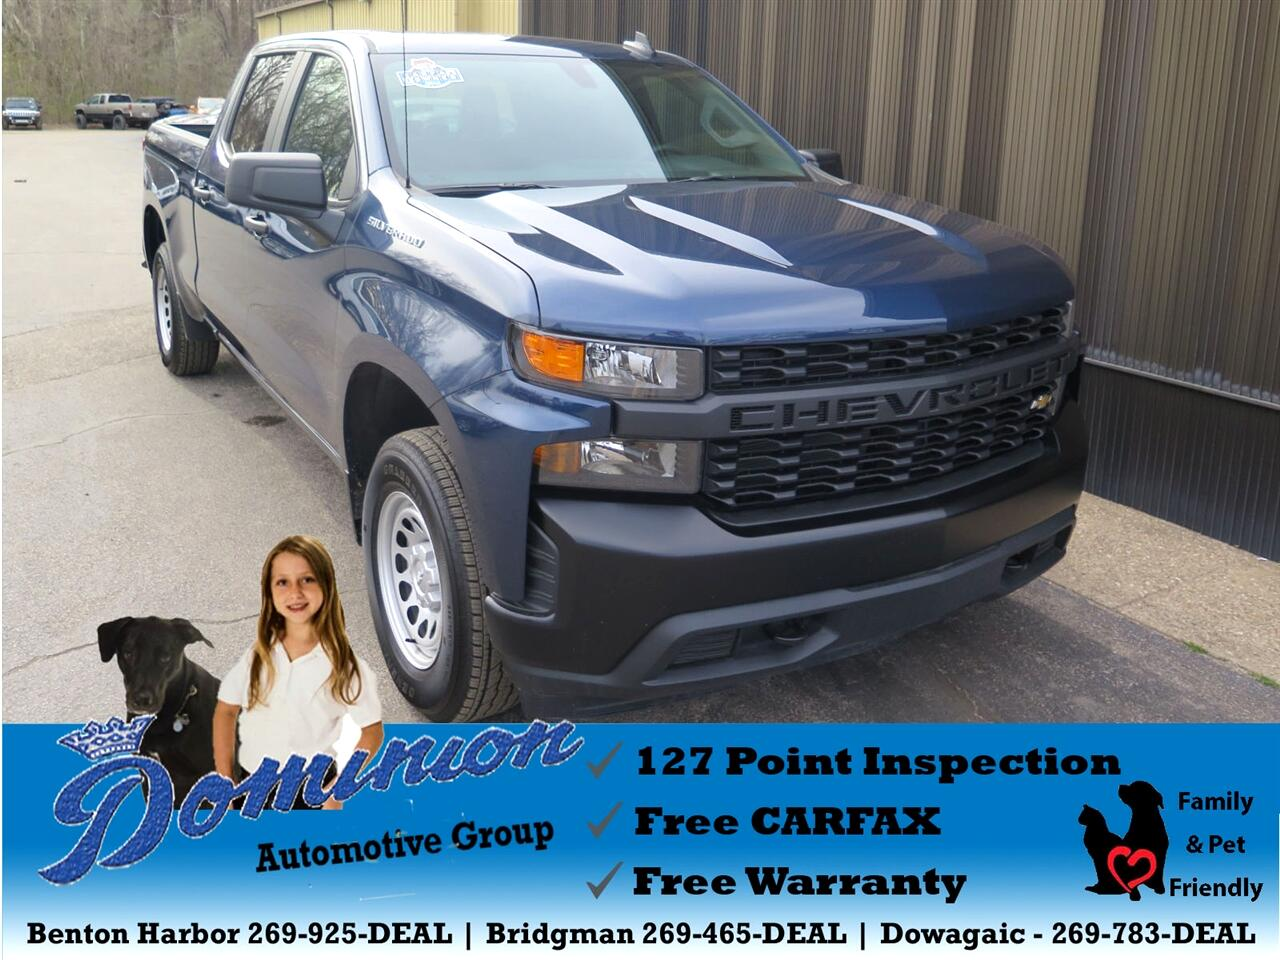 2019 Chevrolet Silverado 1500 Work Truck Crew Cab Long Box 4WD